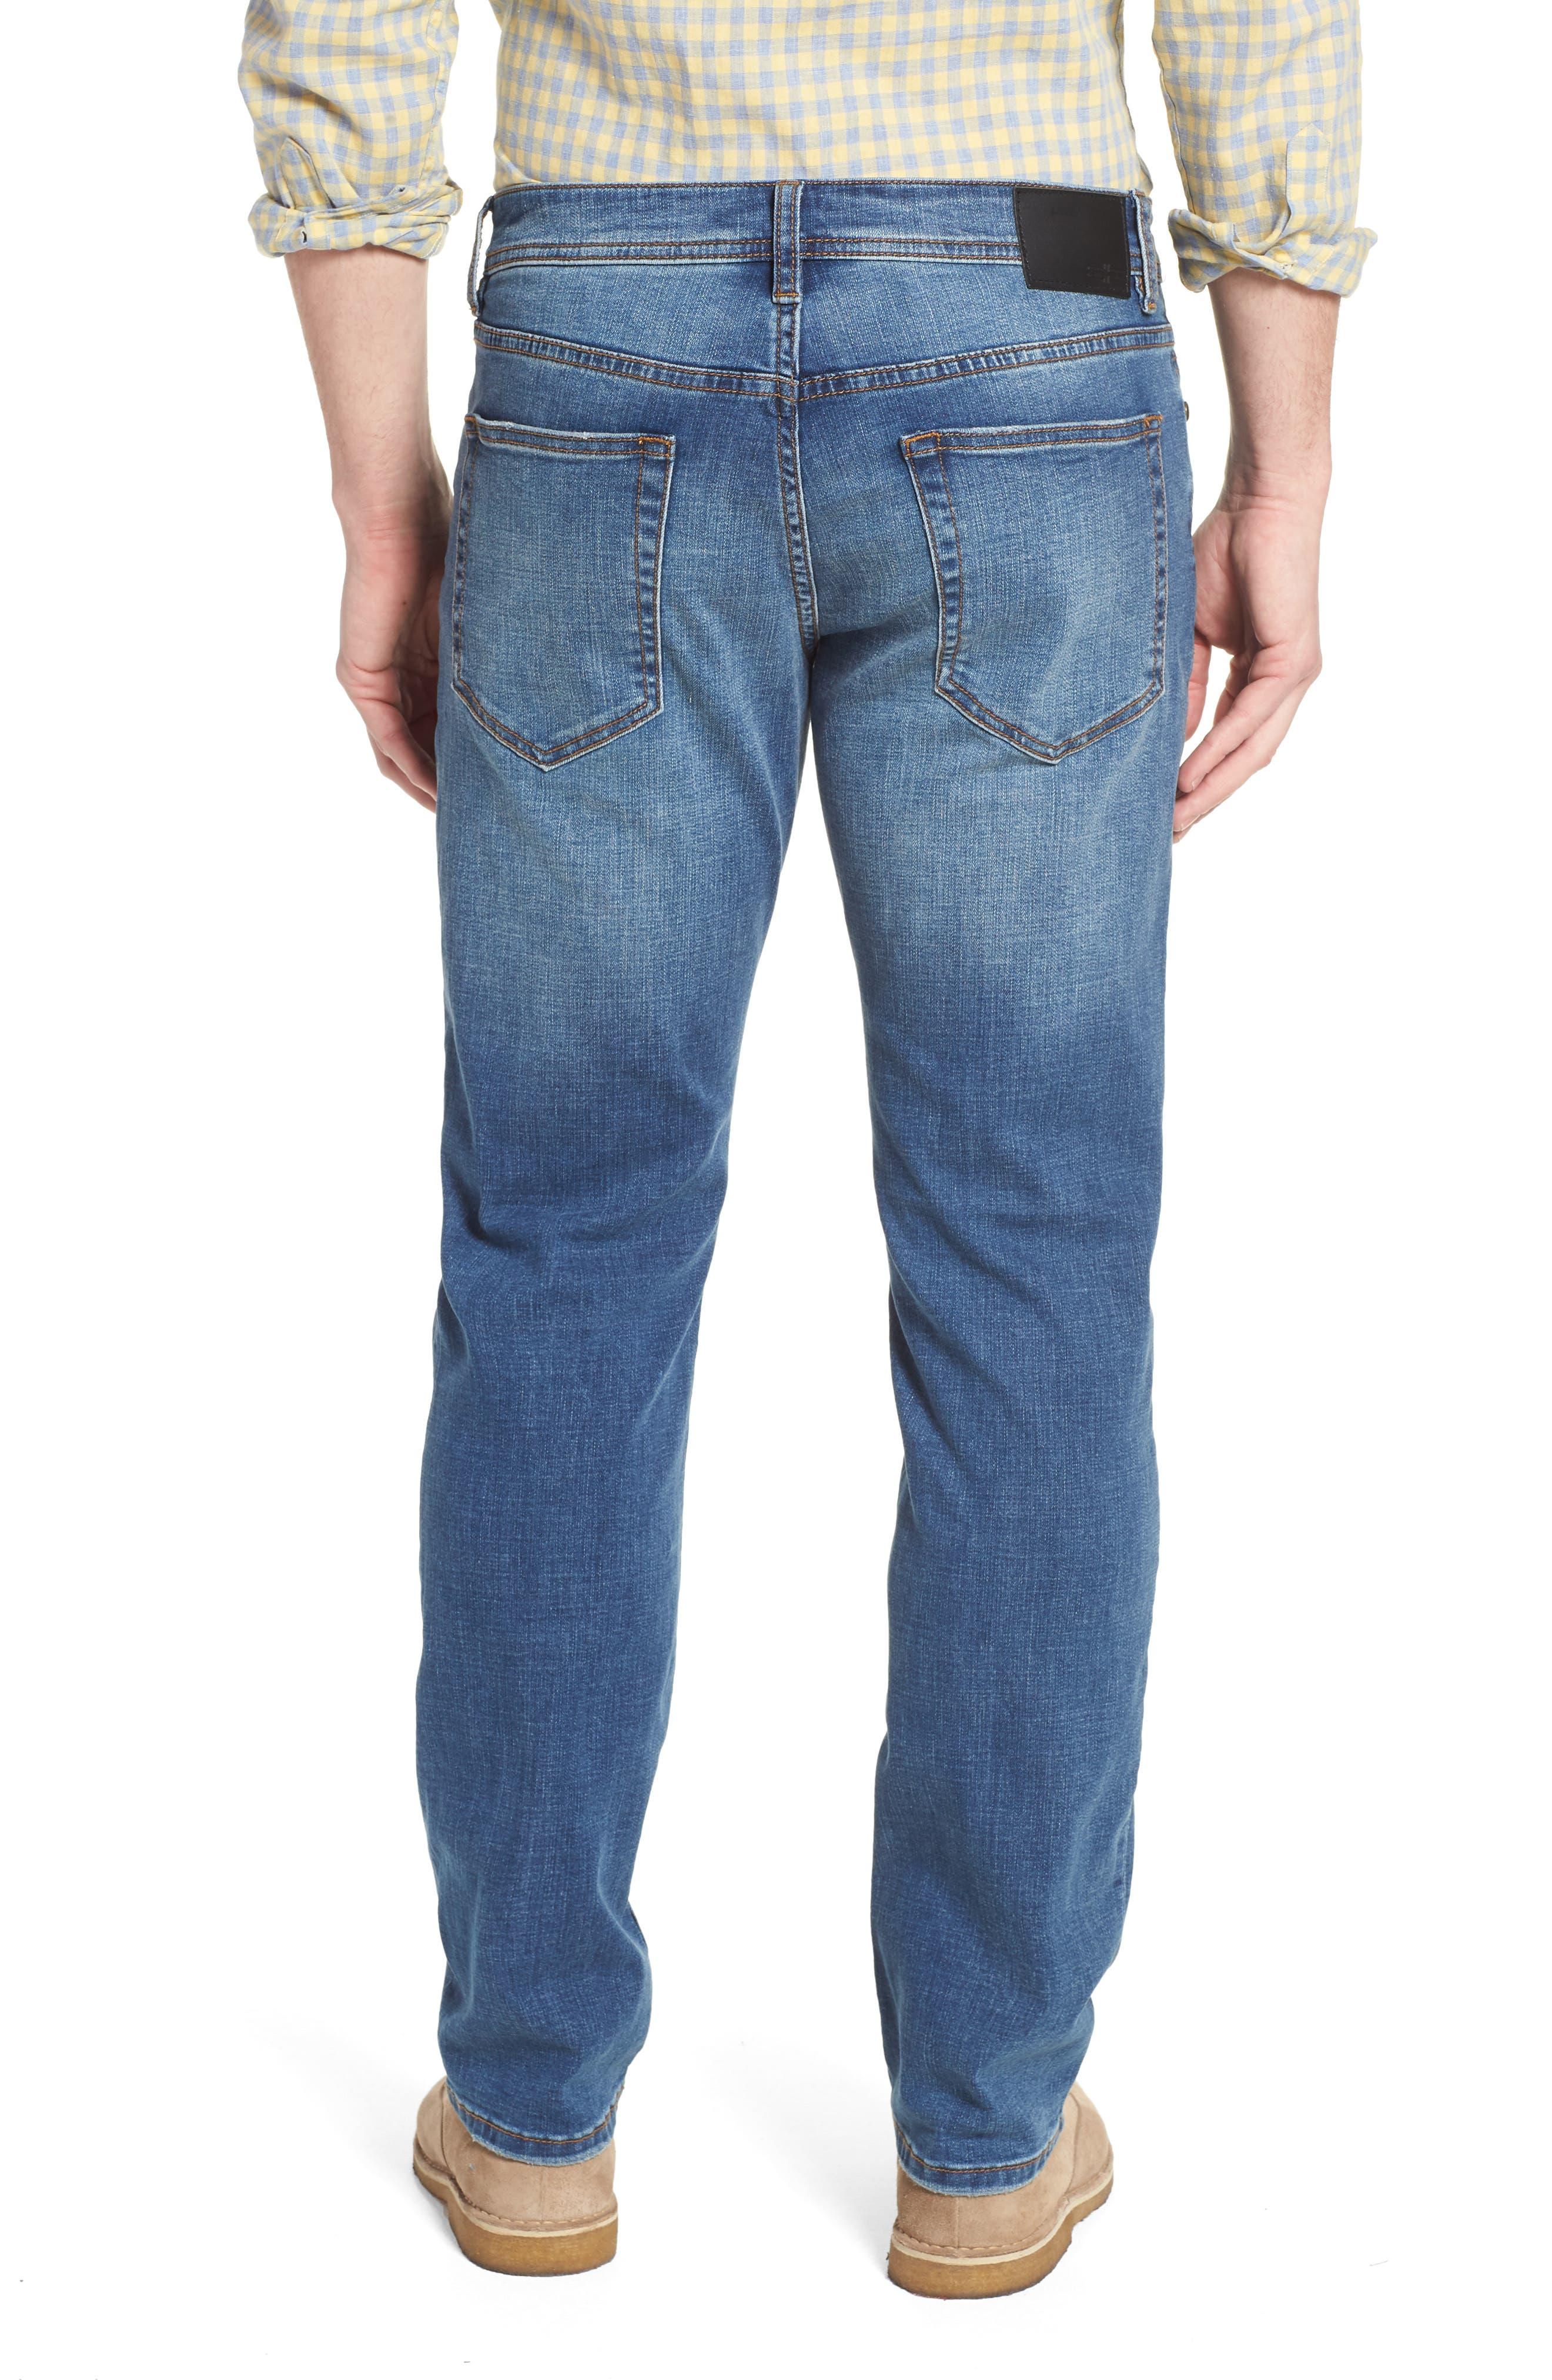 Jeans Co. Regent Relaxed Straight Leg Jeans,                             Alternate thumbnail 2, color,